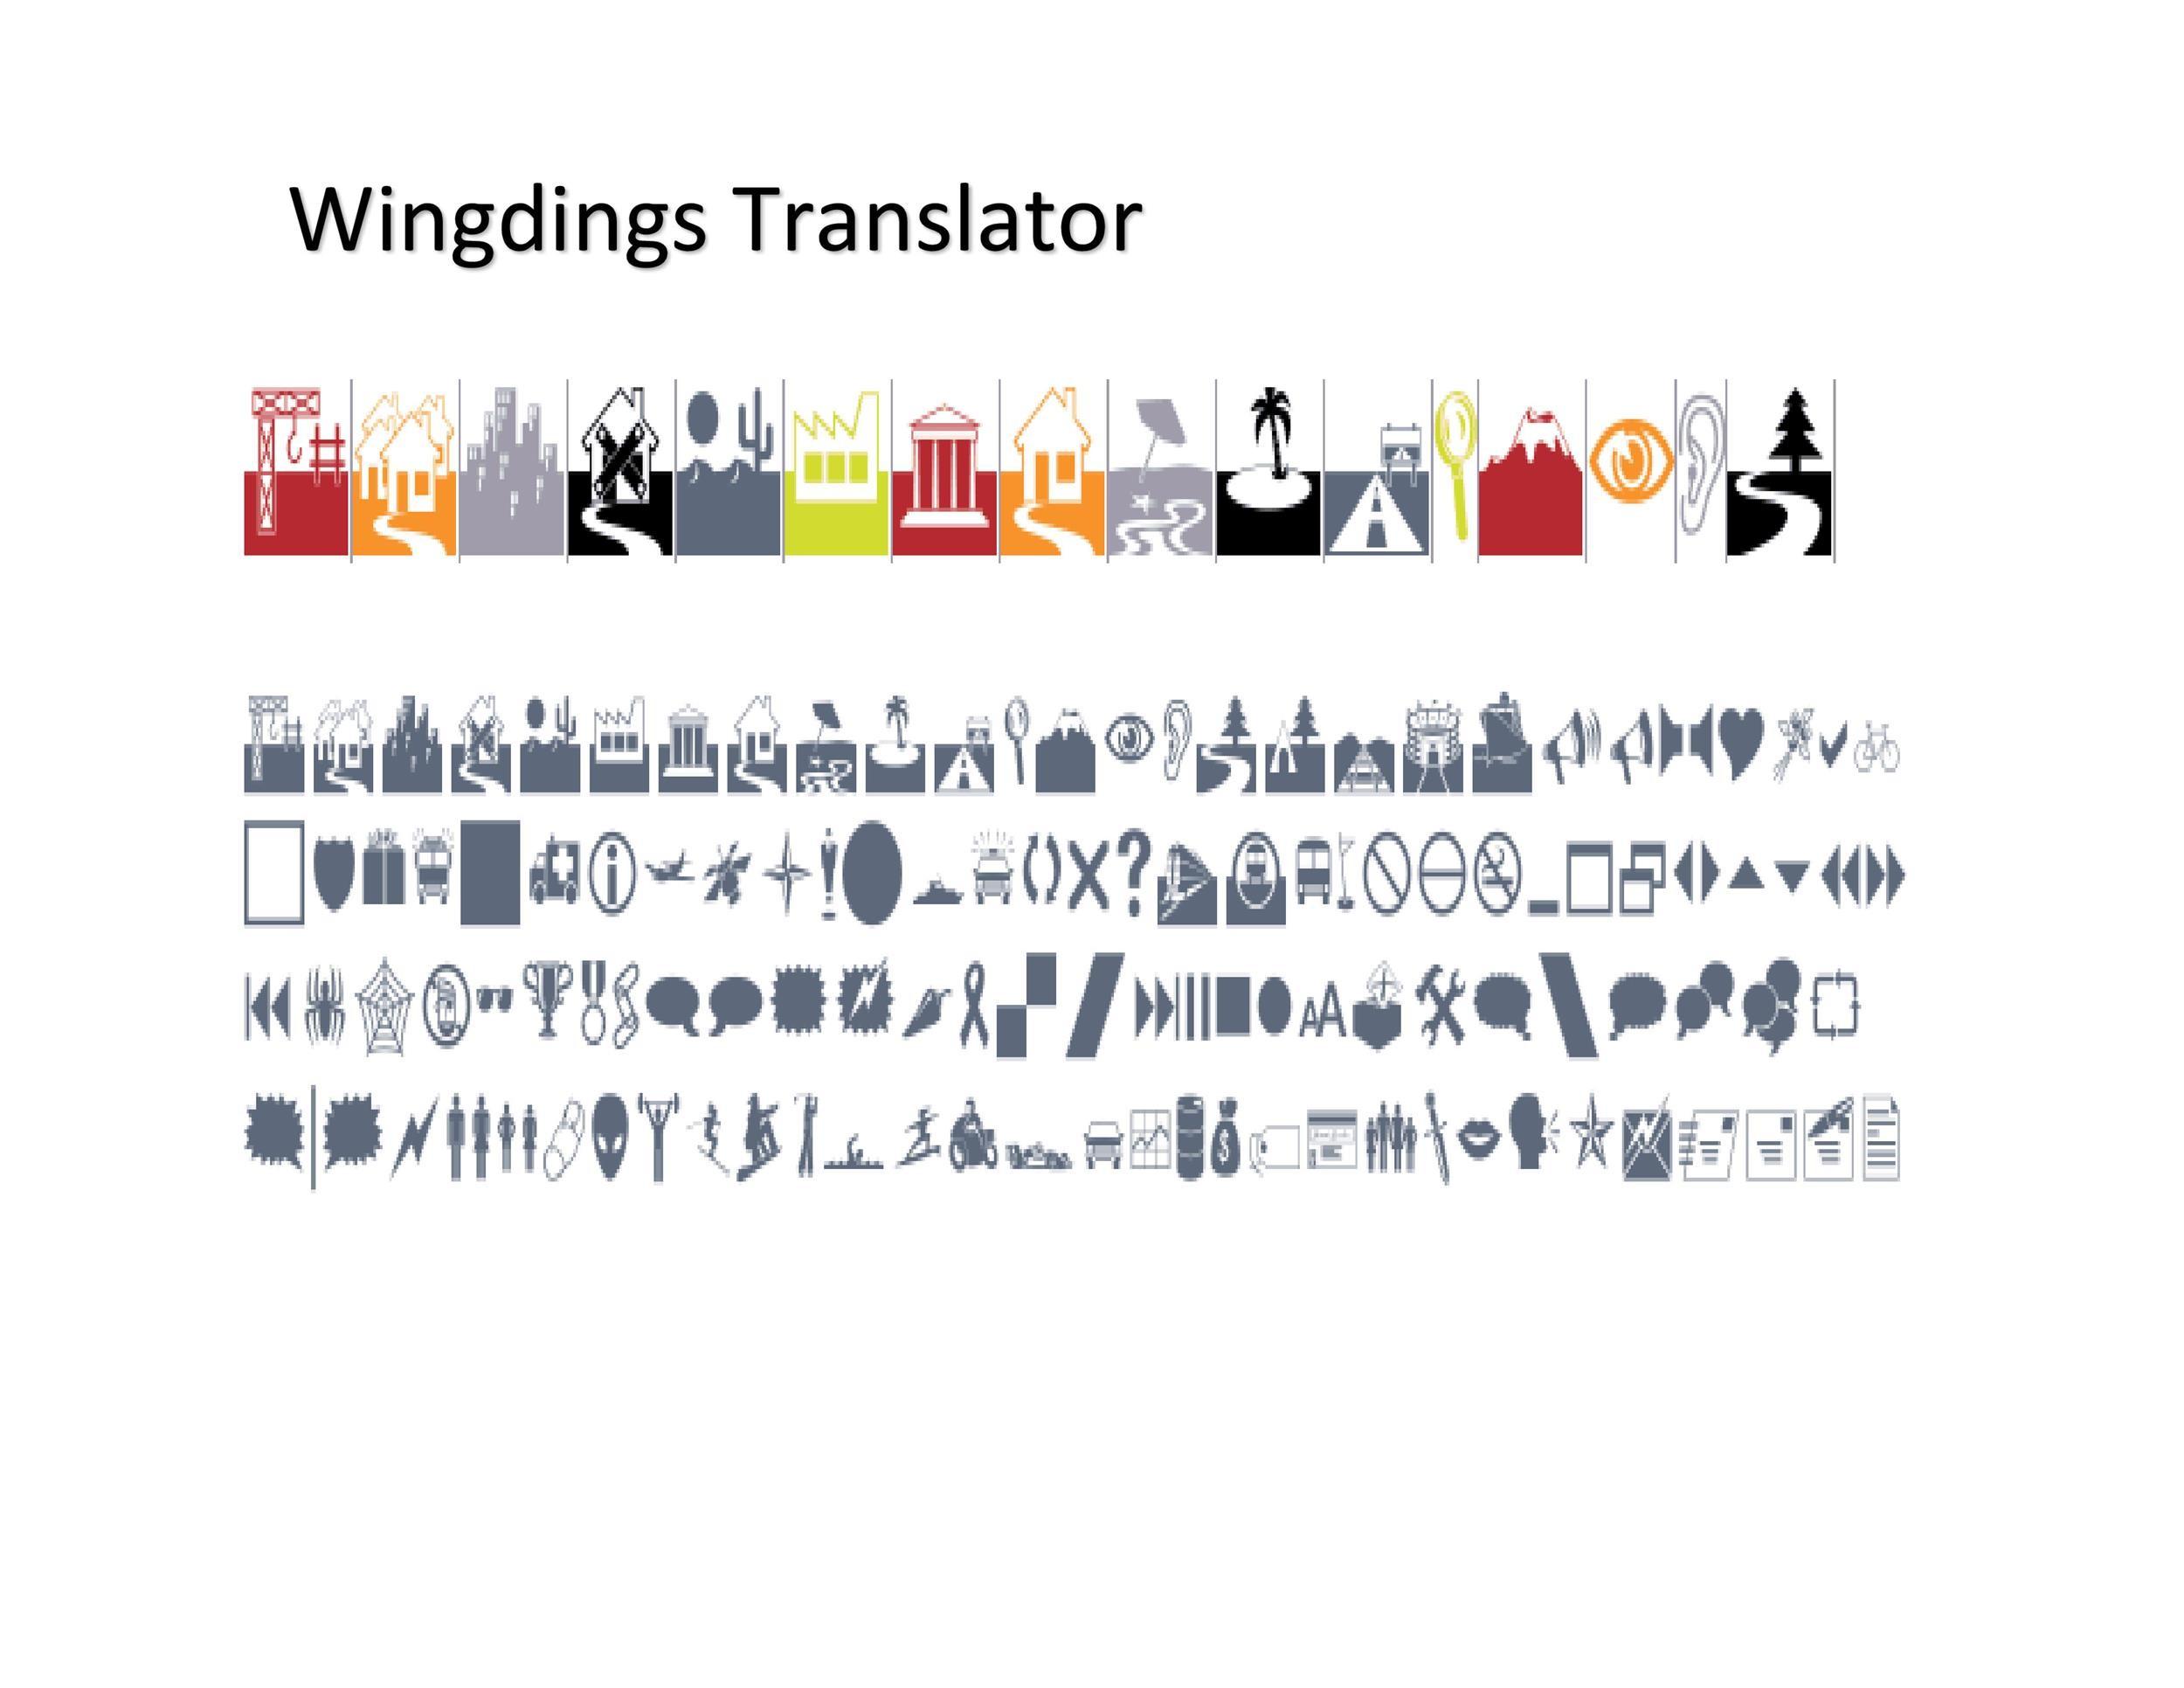 Free wingdings translator template 18